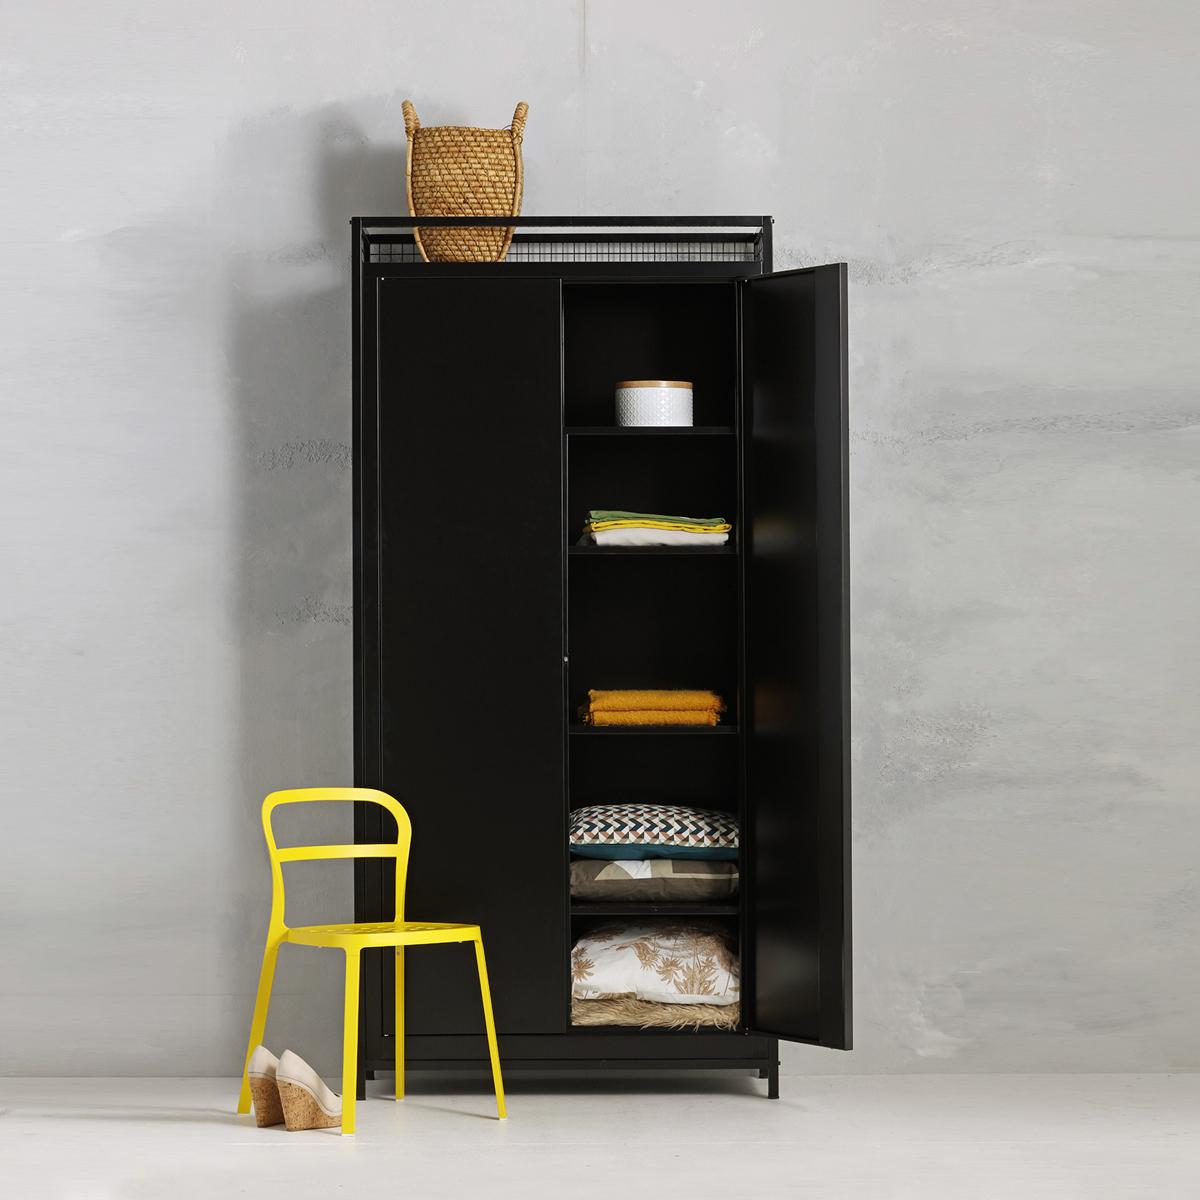 Industriële opbergkast - zwart - 220x105.3x44.5 cm - LCS-109